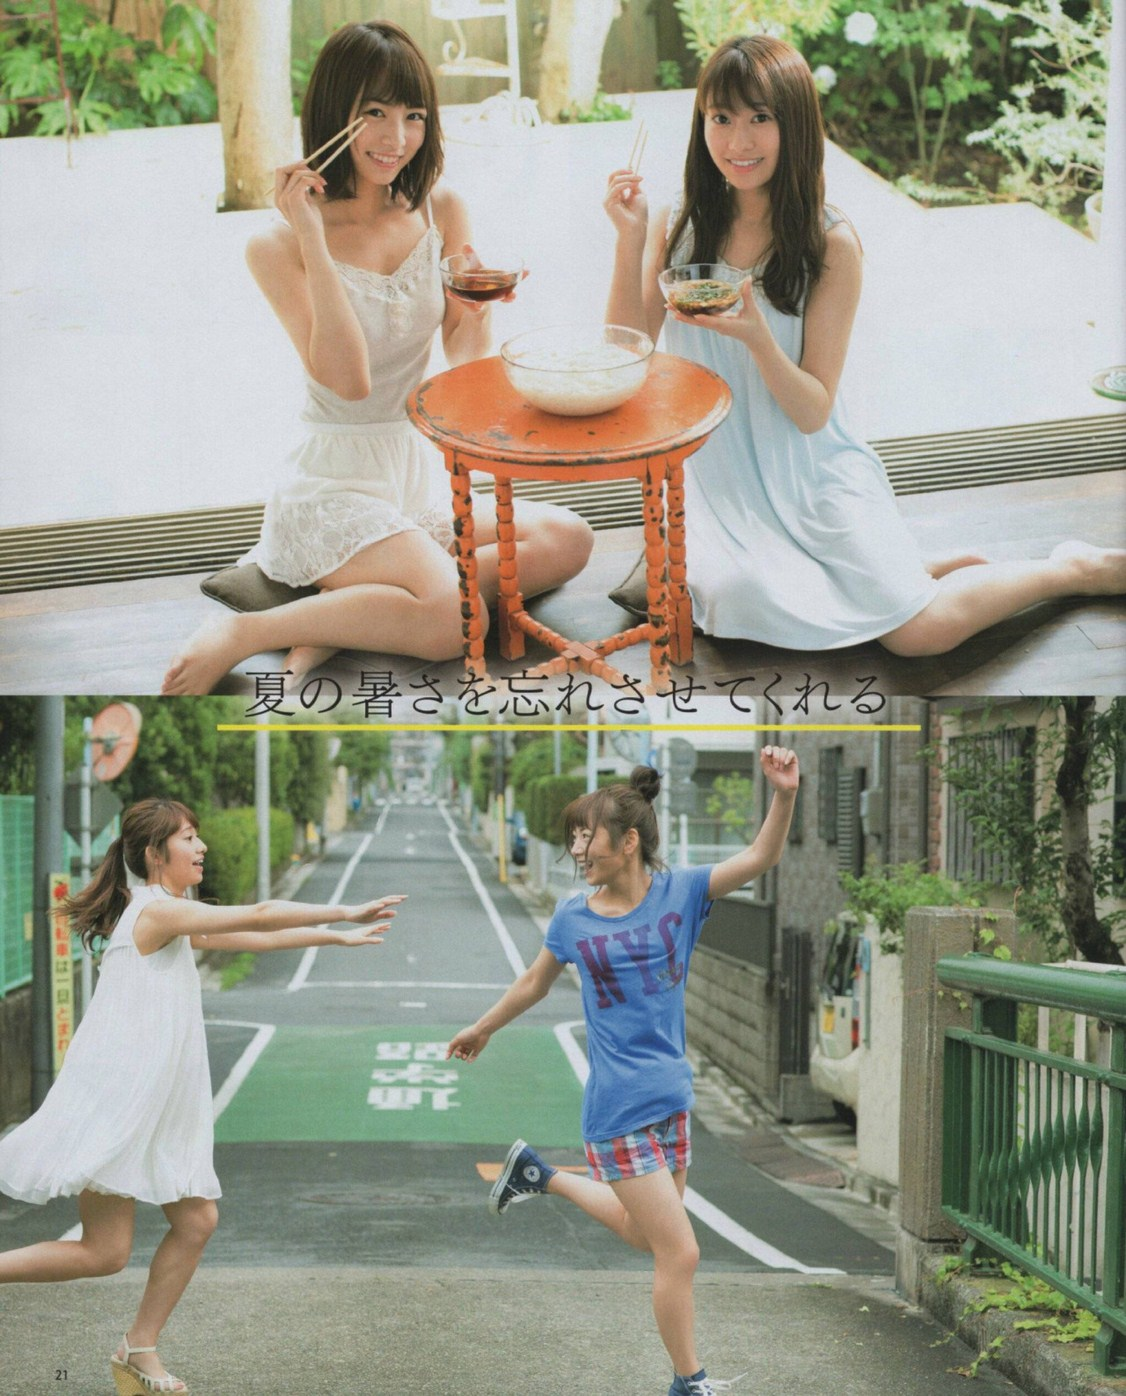 Sakurai Reika 桜井玲香, Kitano Hinako 北野日奈子 Nogizaka46, BOMB Magazine 2016.08 Gravure